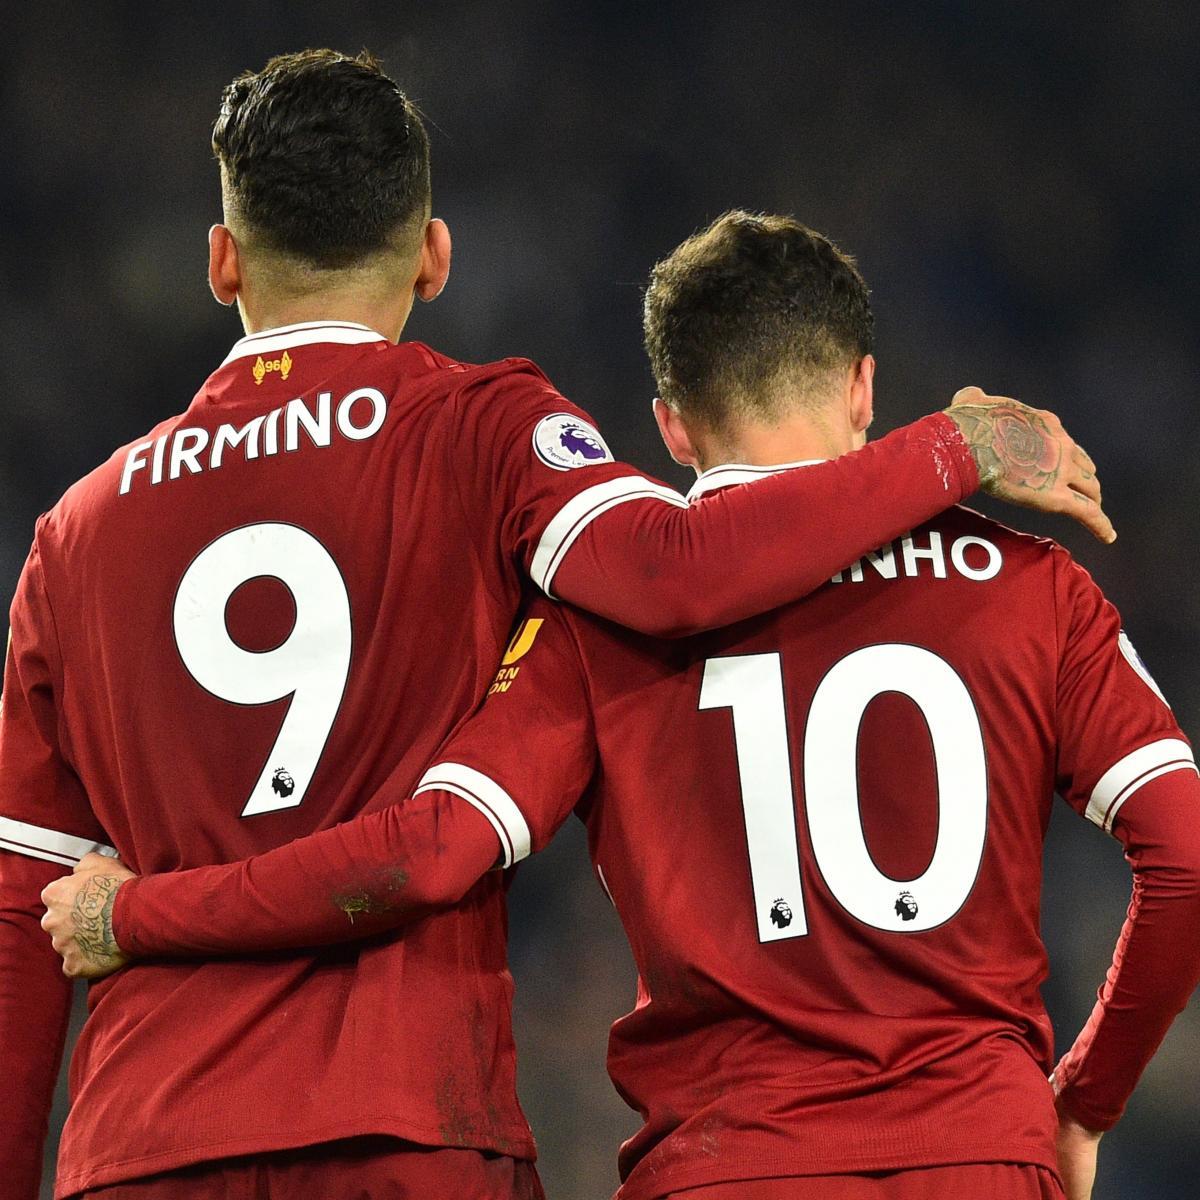 Live Streaming Soccer News Liverpool Vs Benfica Live: Liverpool Vs. Spartak Moskva: Team News, Preview, Live